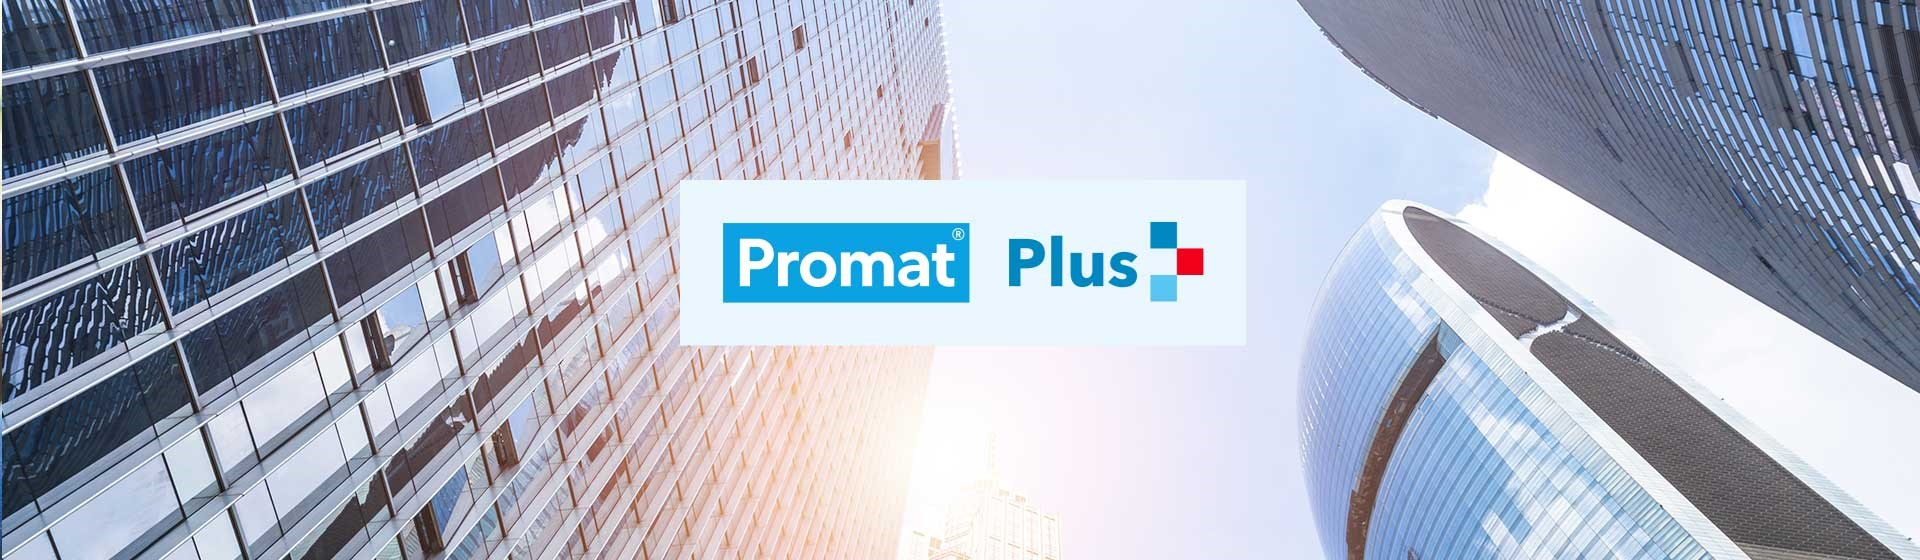 Banner Promat Plus